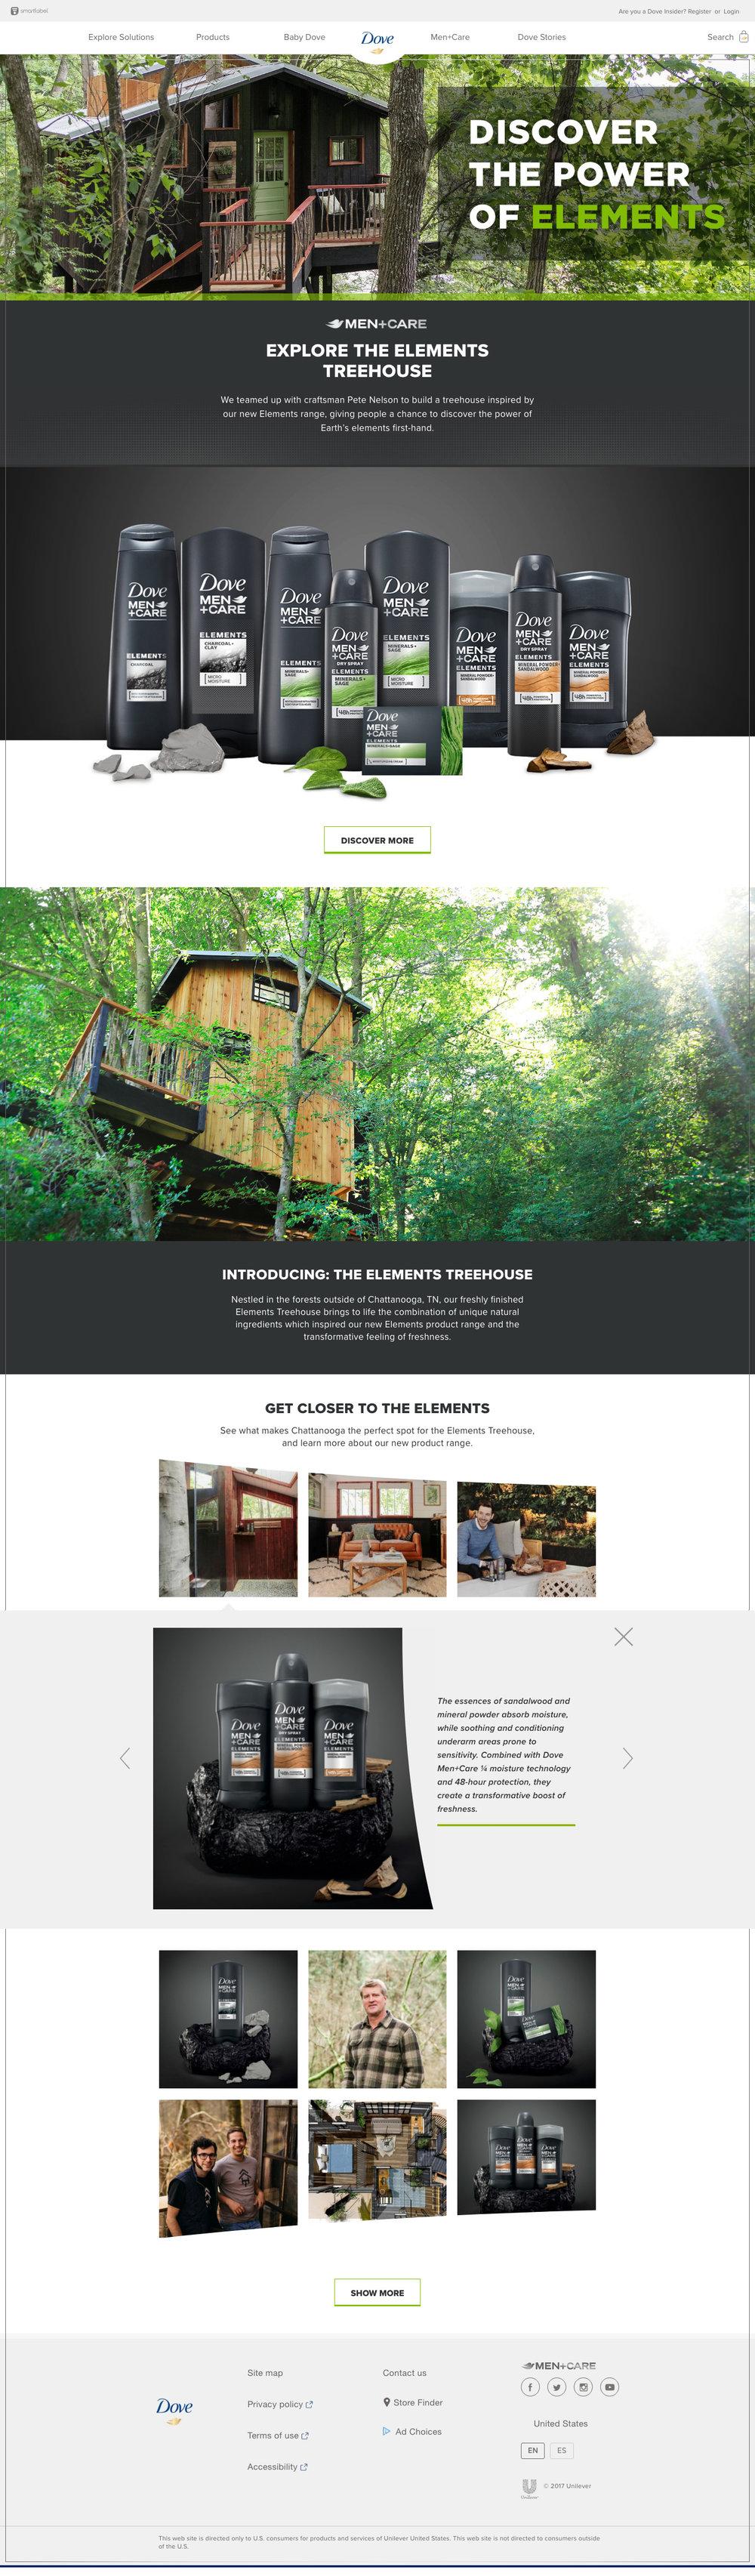 treehouse-psdd.jpg